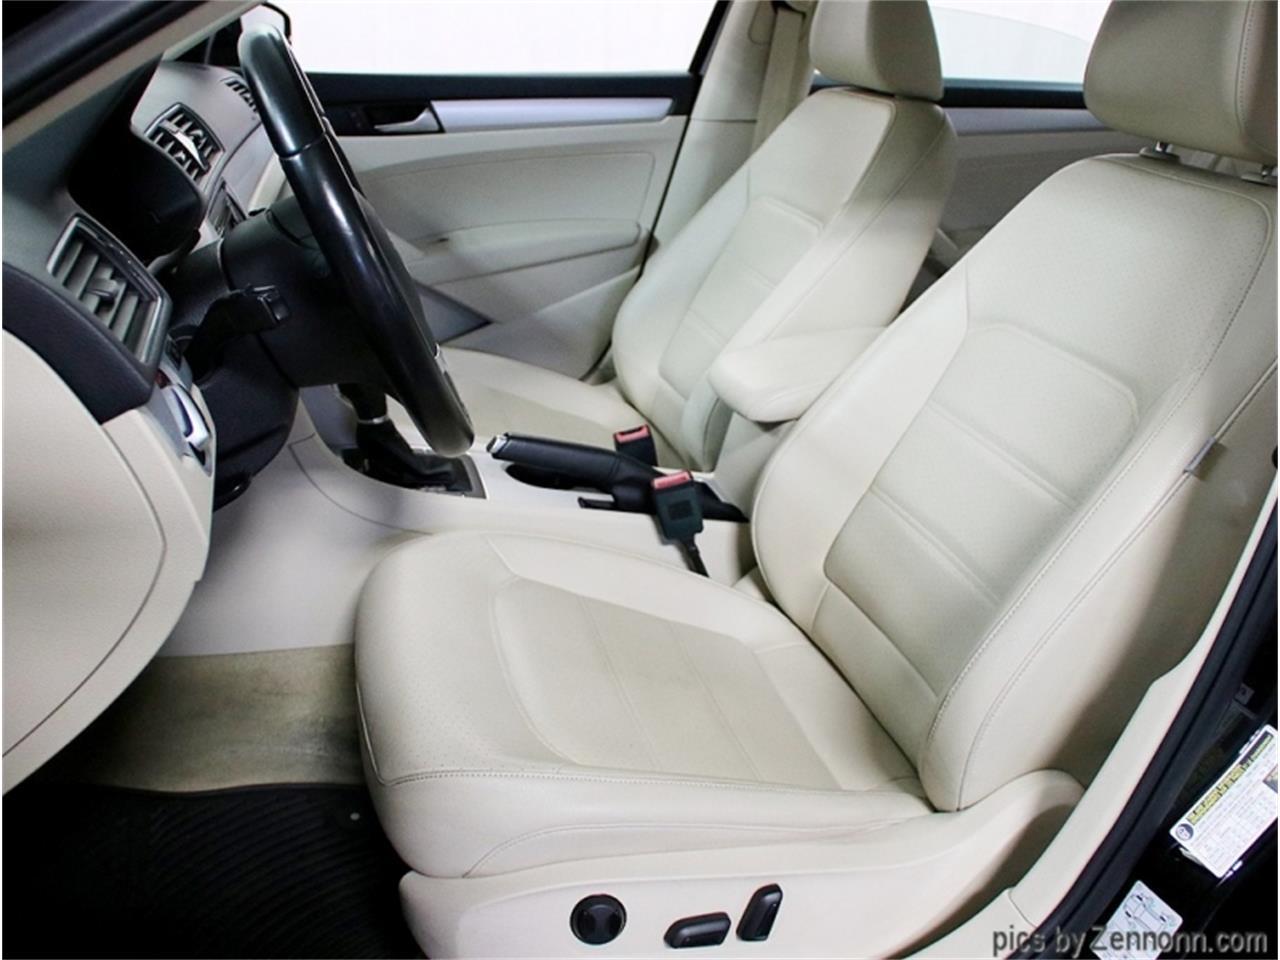 2013 Volkswagen Passat (CC-1413182) for sale in Addison, Illinois